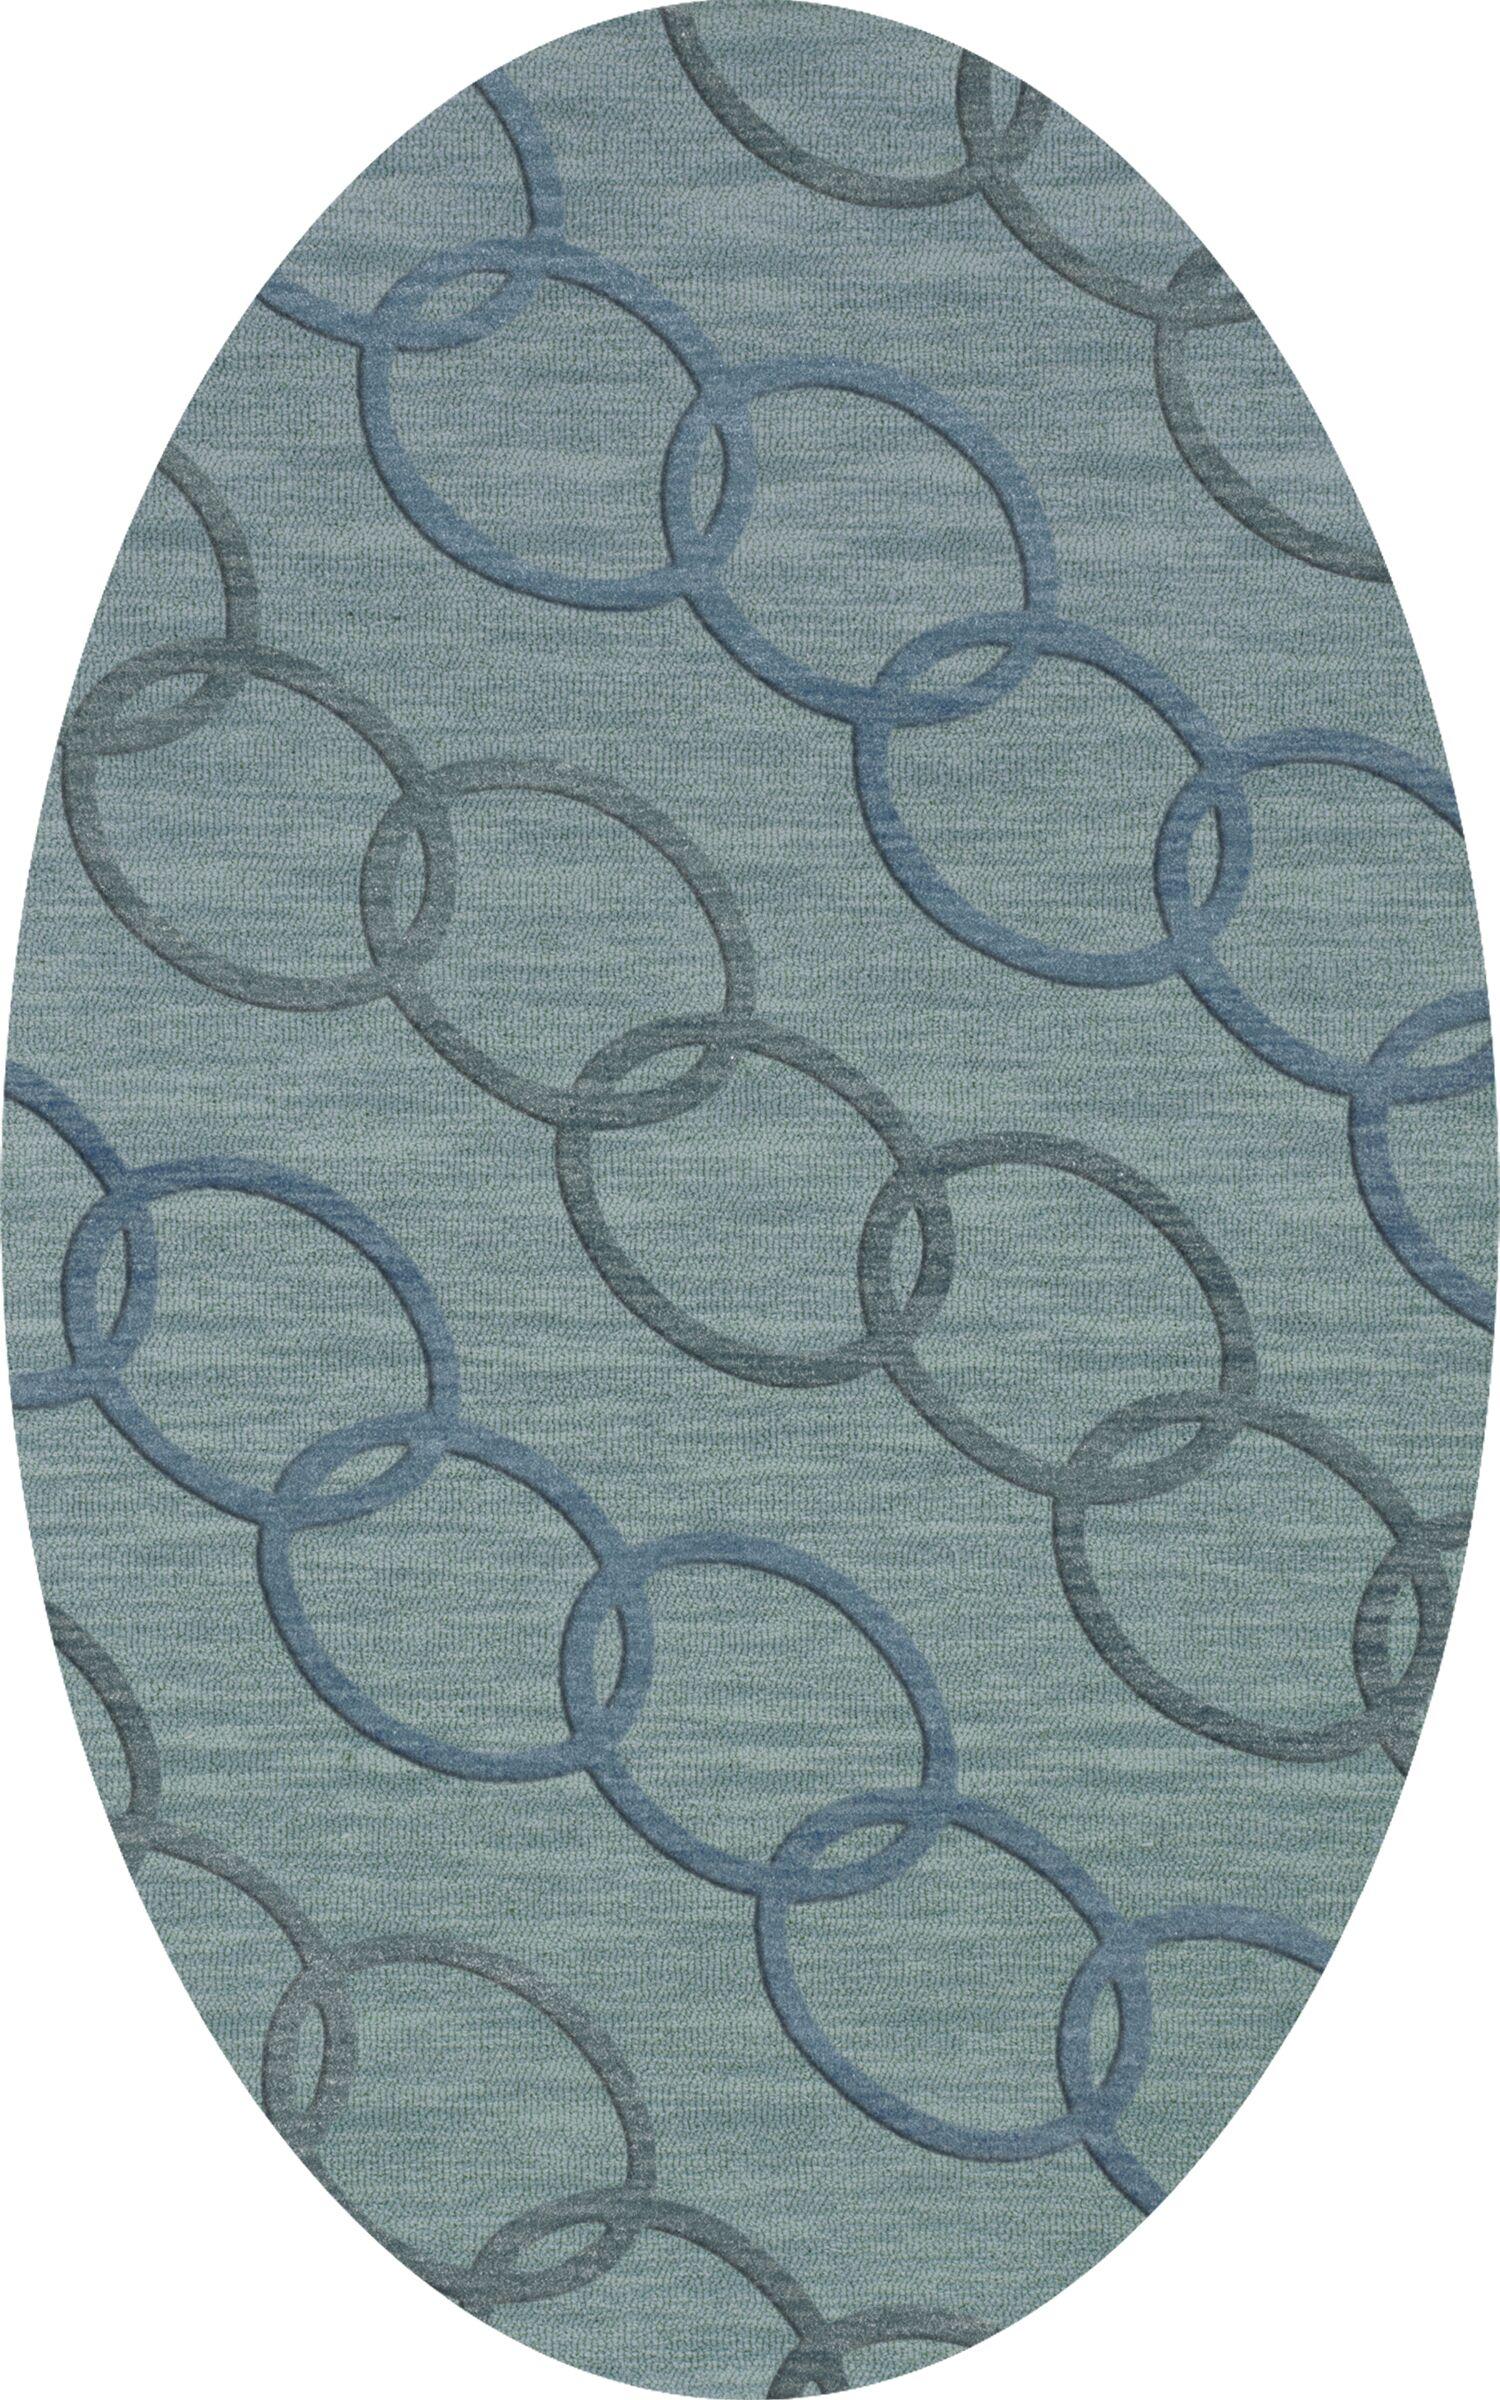 Bella Blue Blue Area Rug Rug Size: Oval 12' x 15'